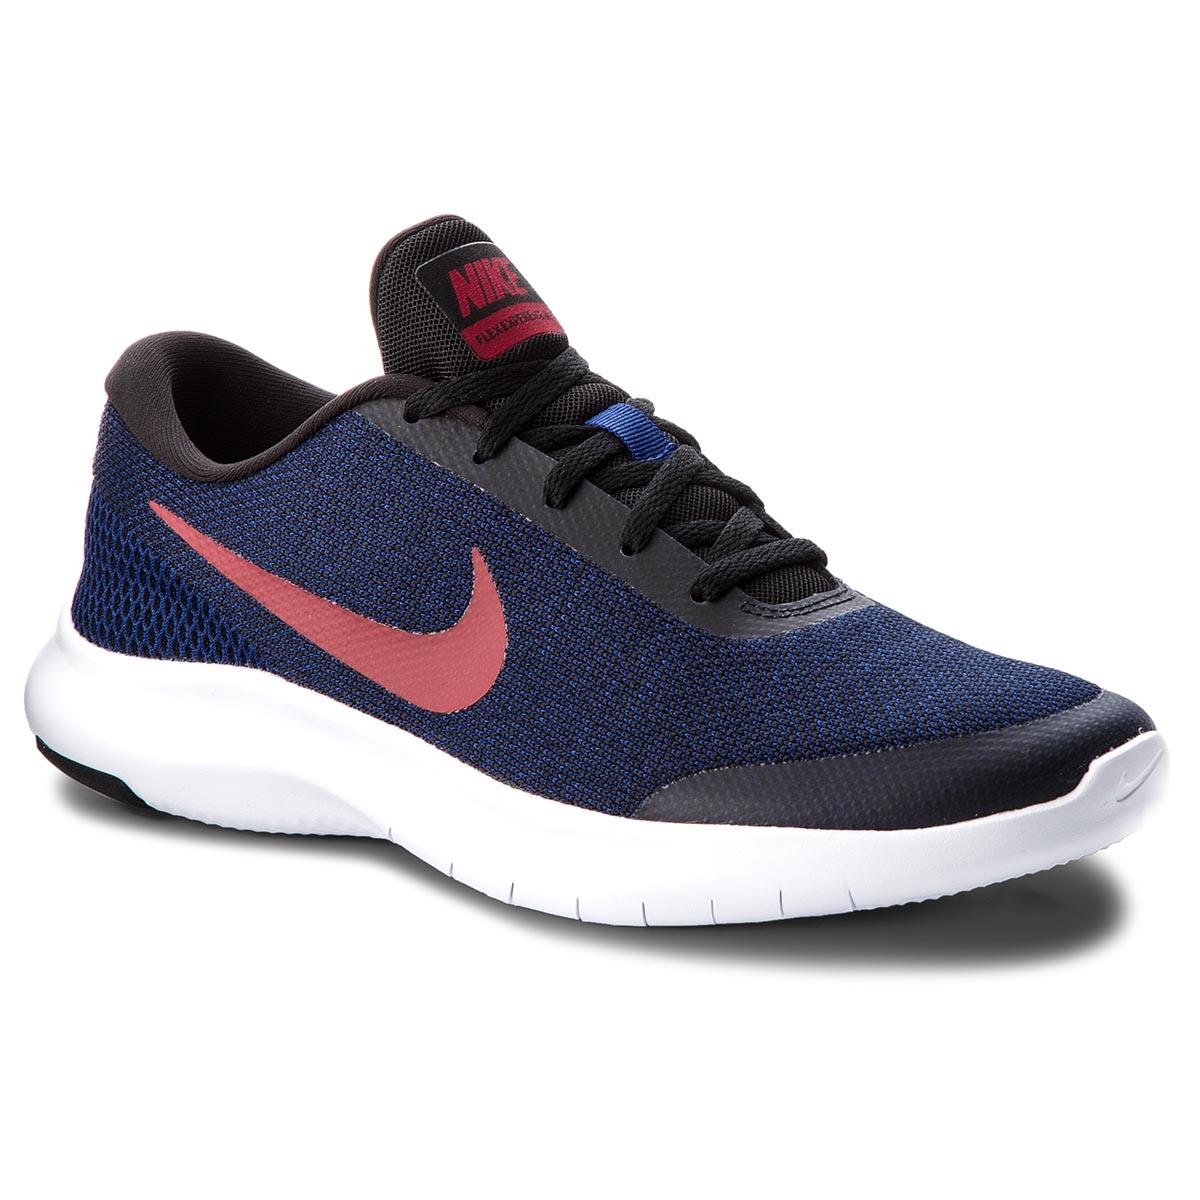 2cb8bae53e Shoes NIKE - Flex Experience Rn 7 908985 403 Deep Royal Blue Blue ...